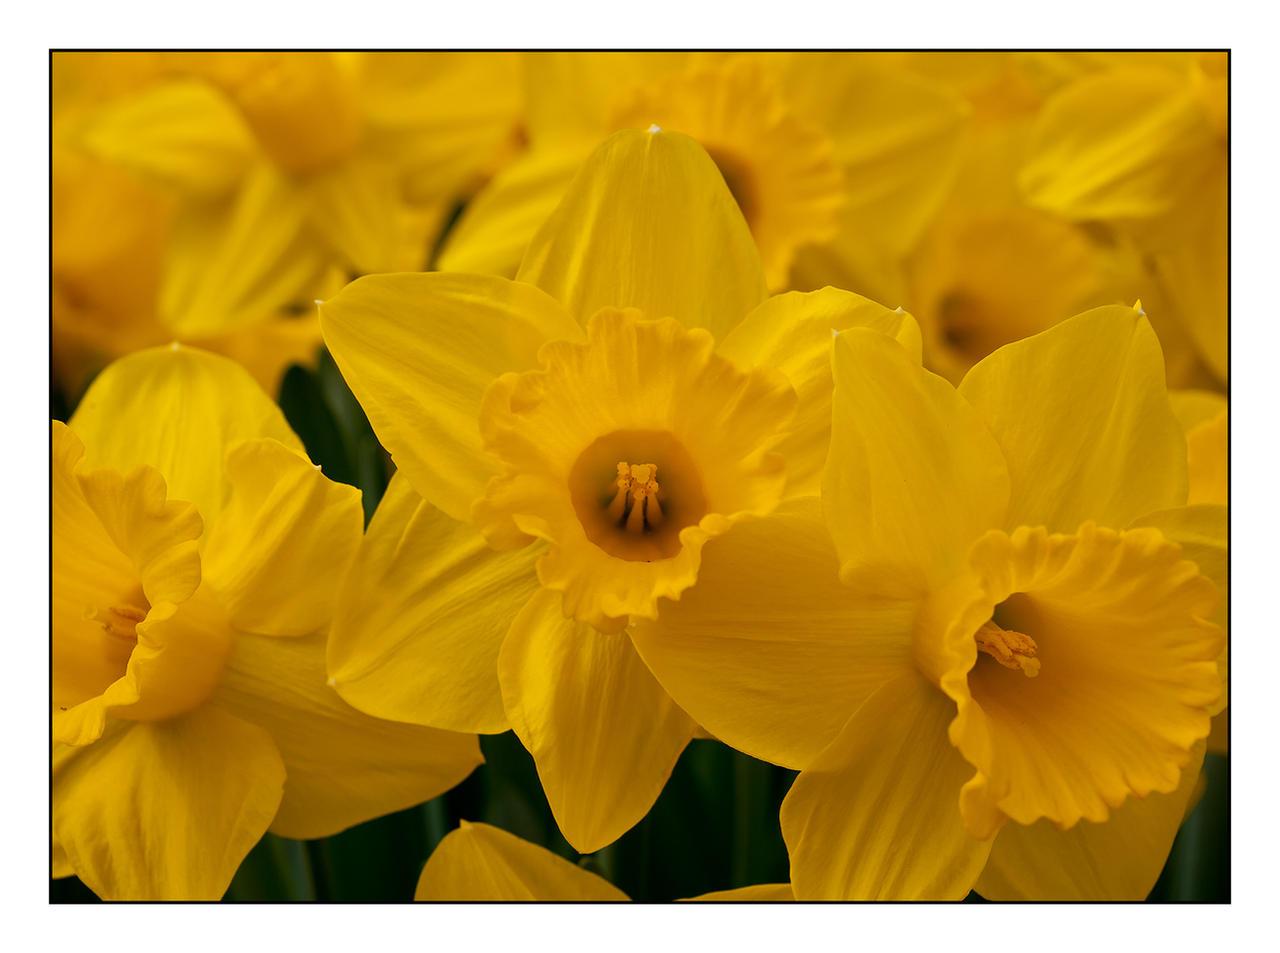 Daffodils Three by Frostola